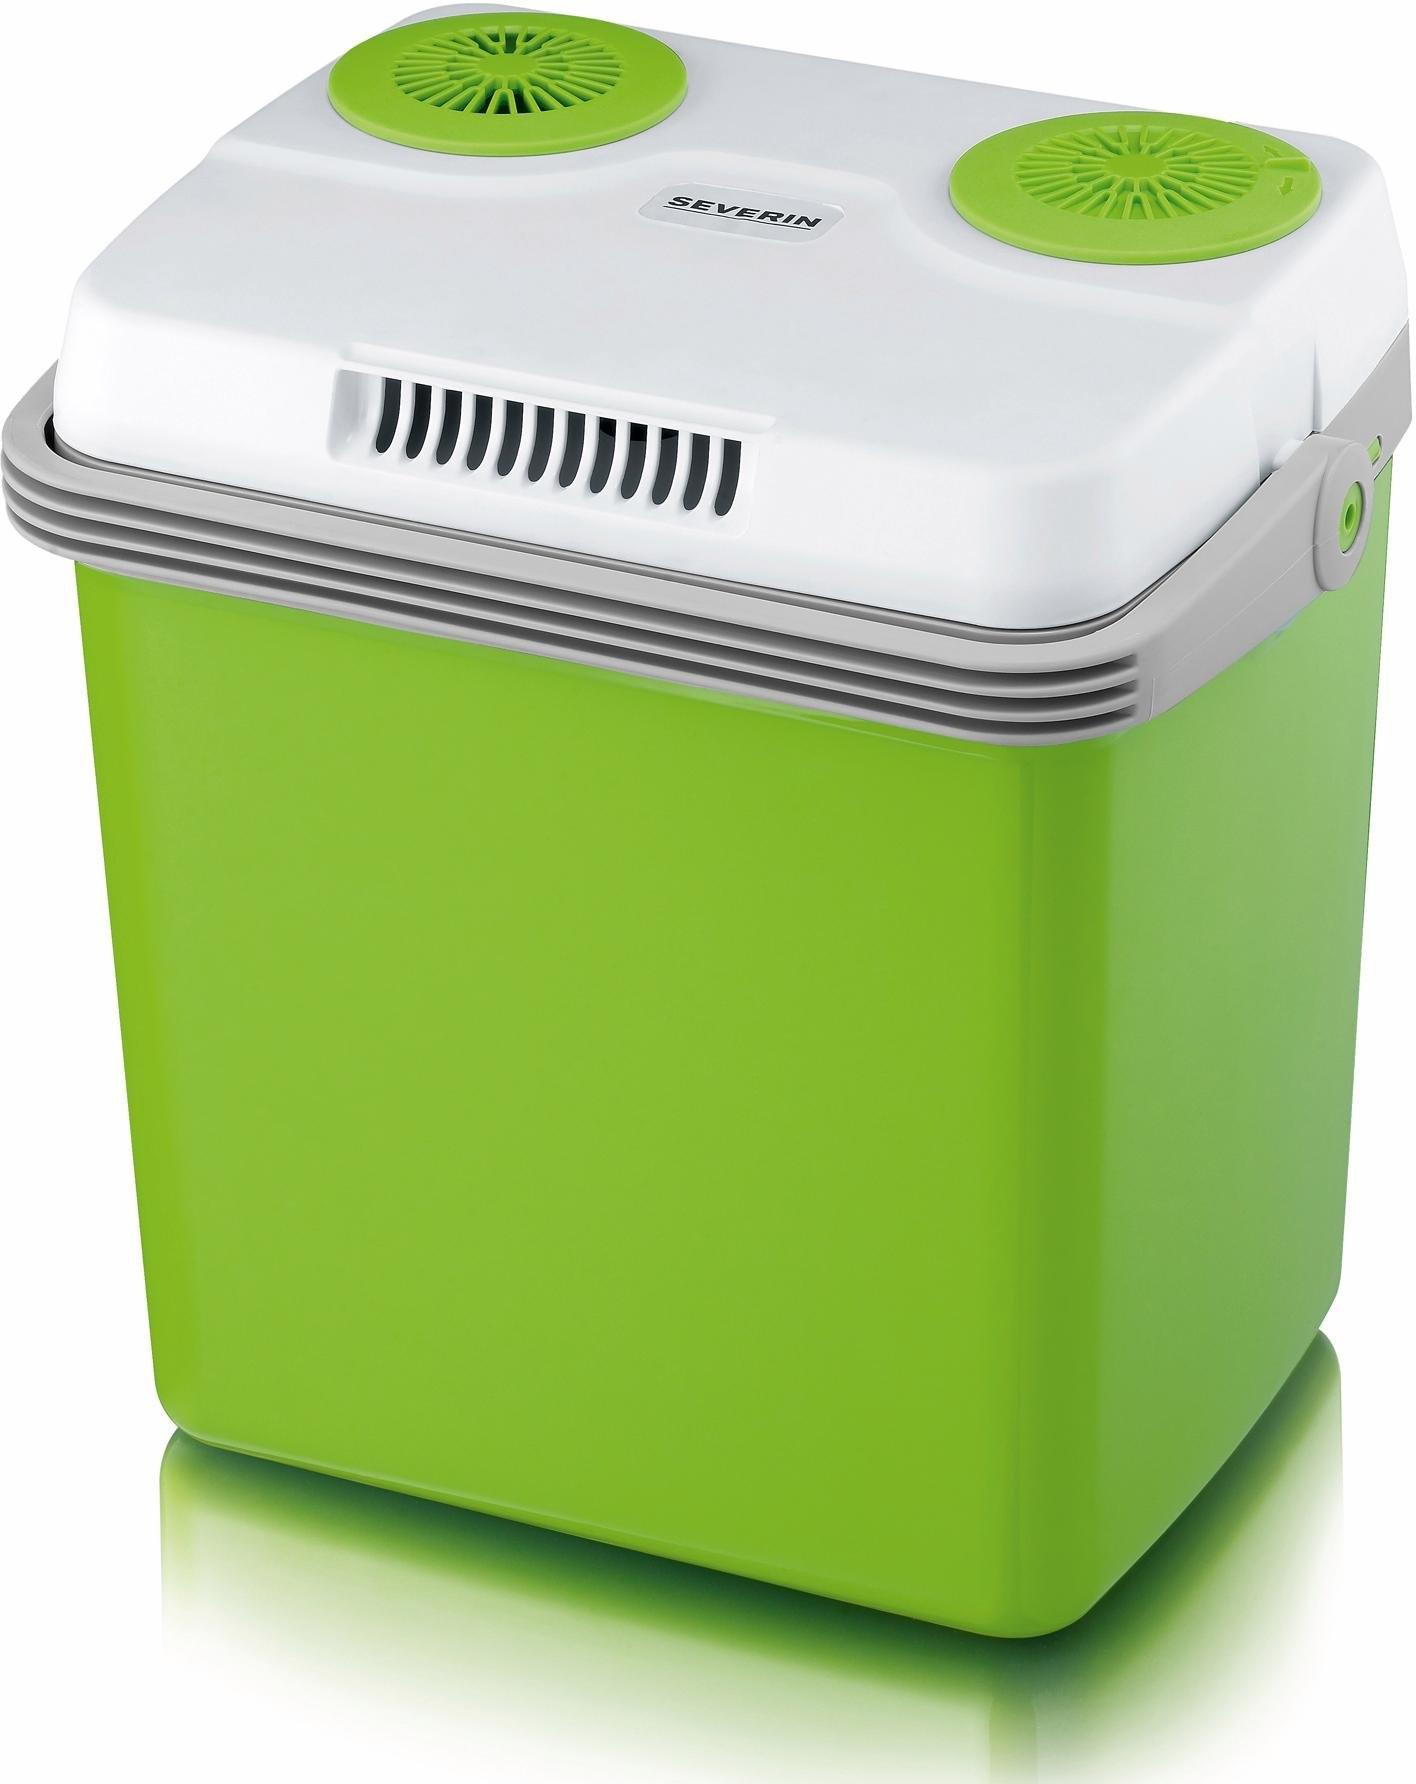 Severin elektrische koelbox KB 2922, energieklasse A++ nu online bestellen